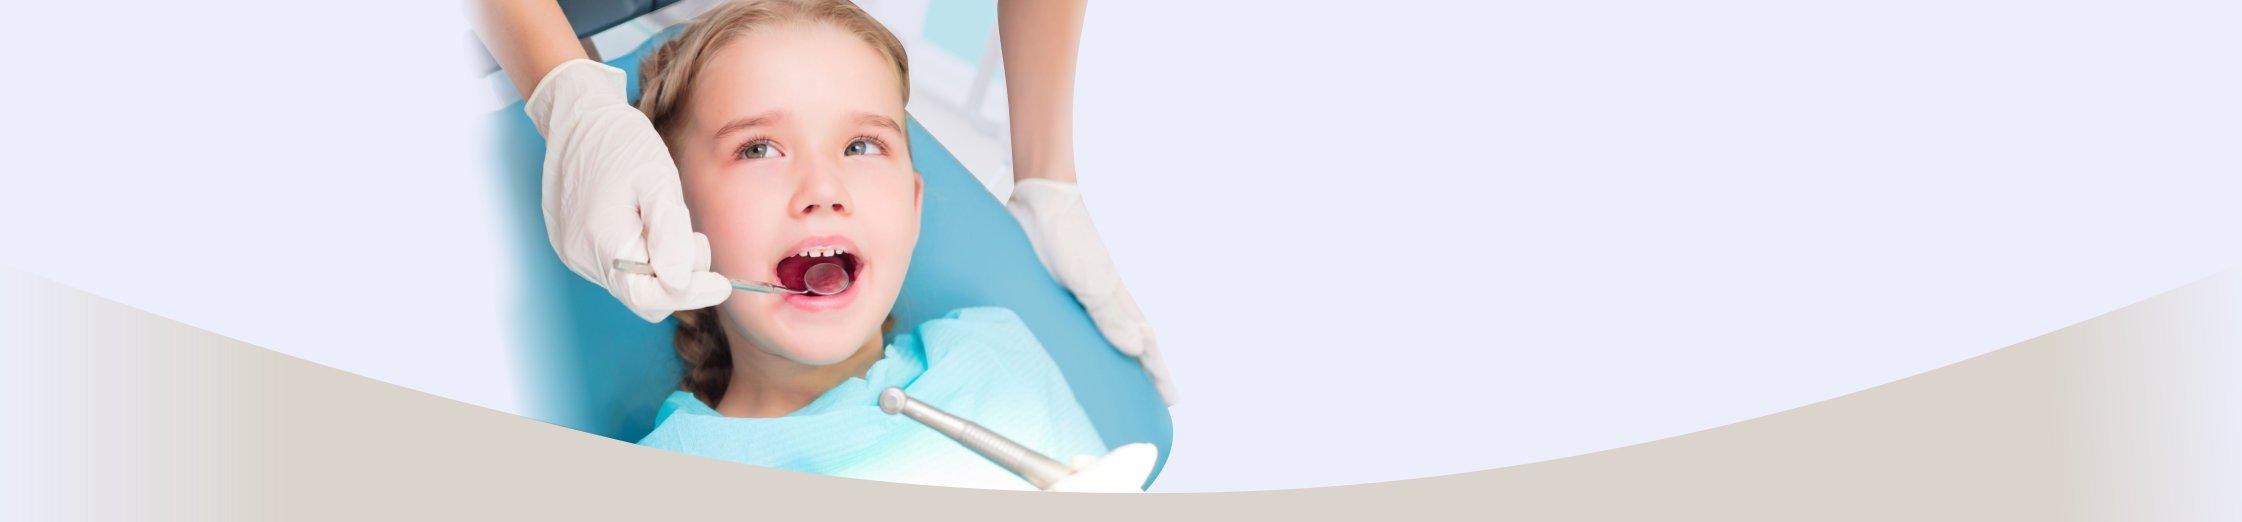 slider-pediatric-dentistry